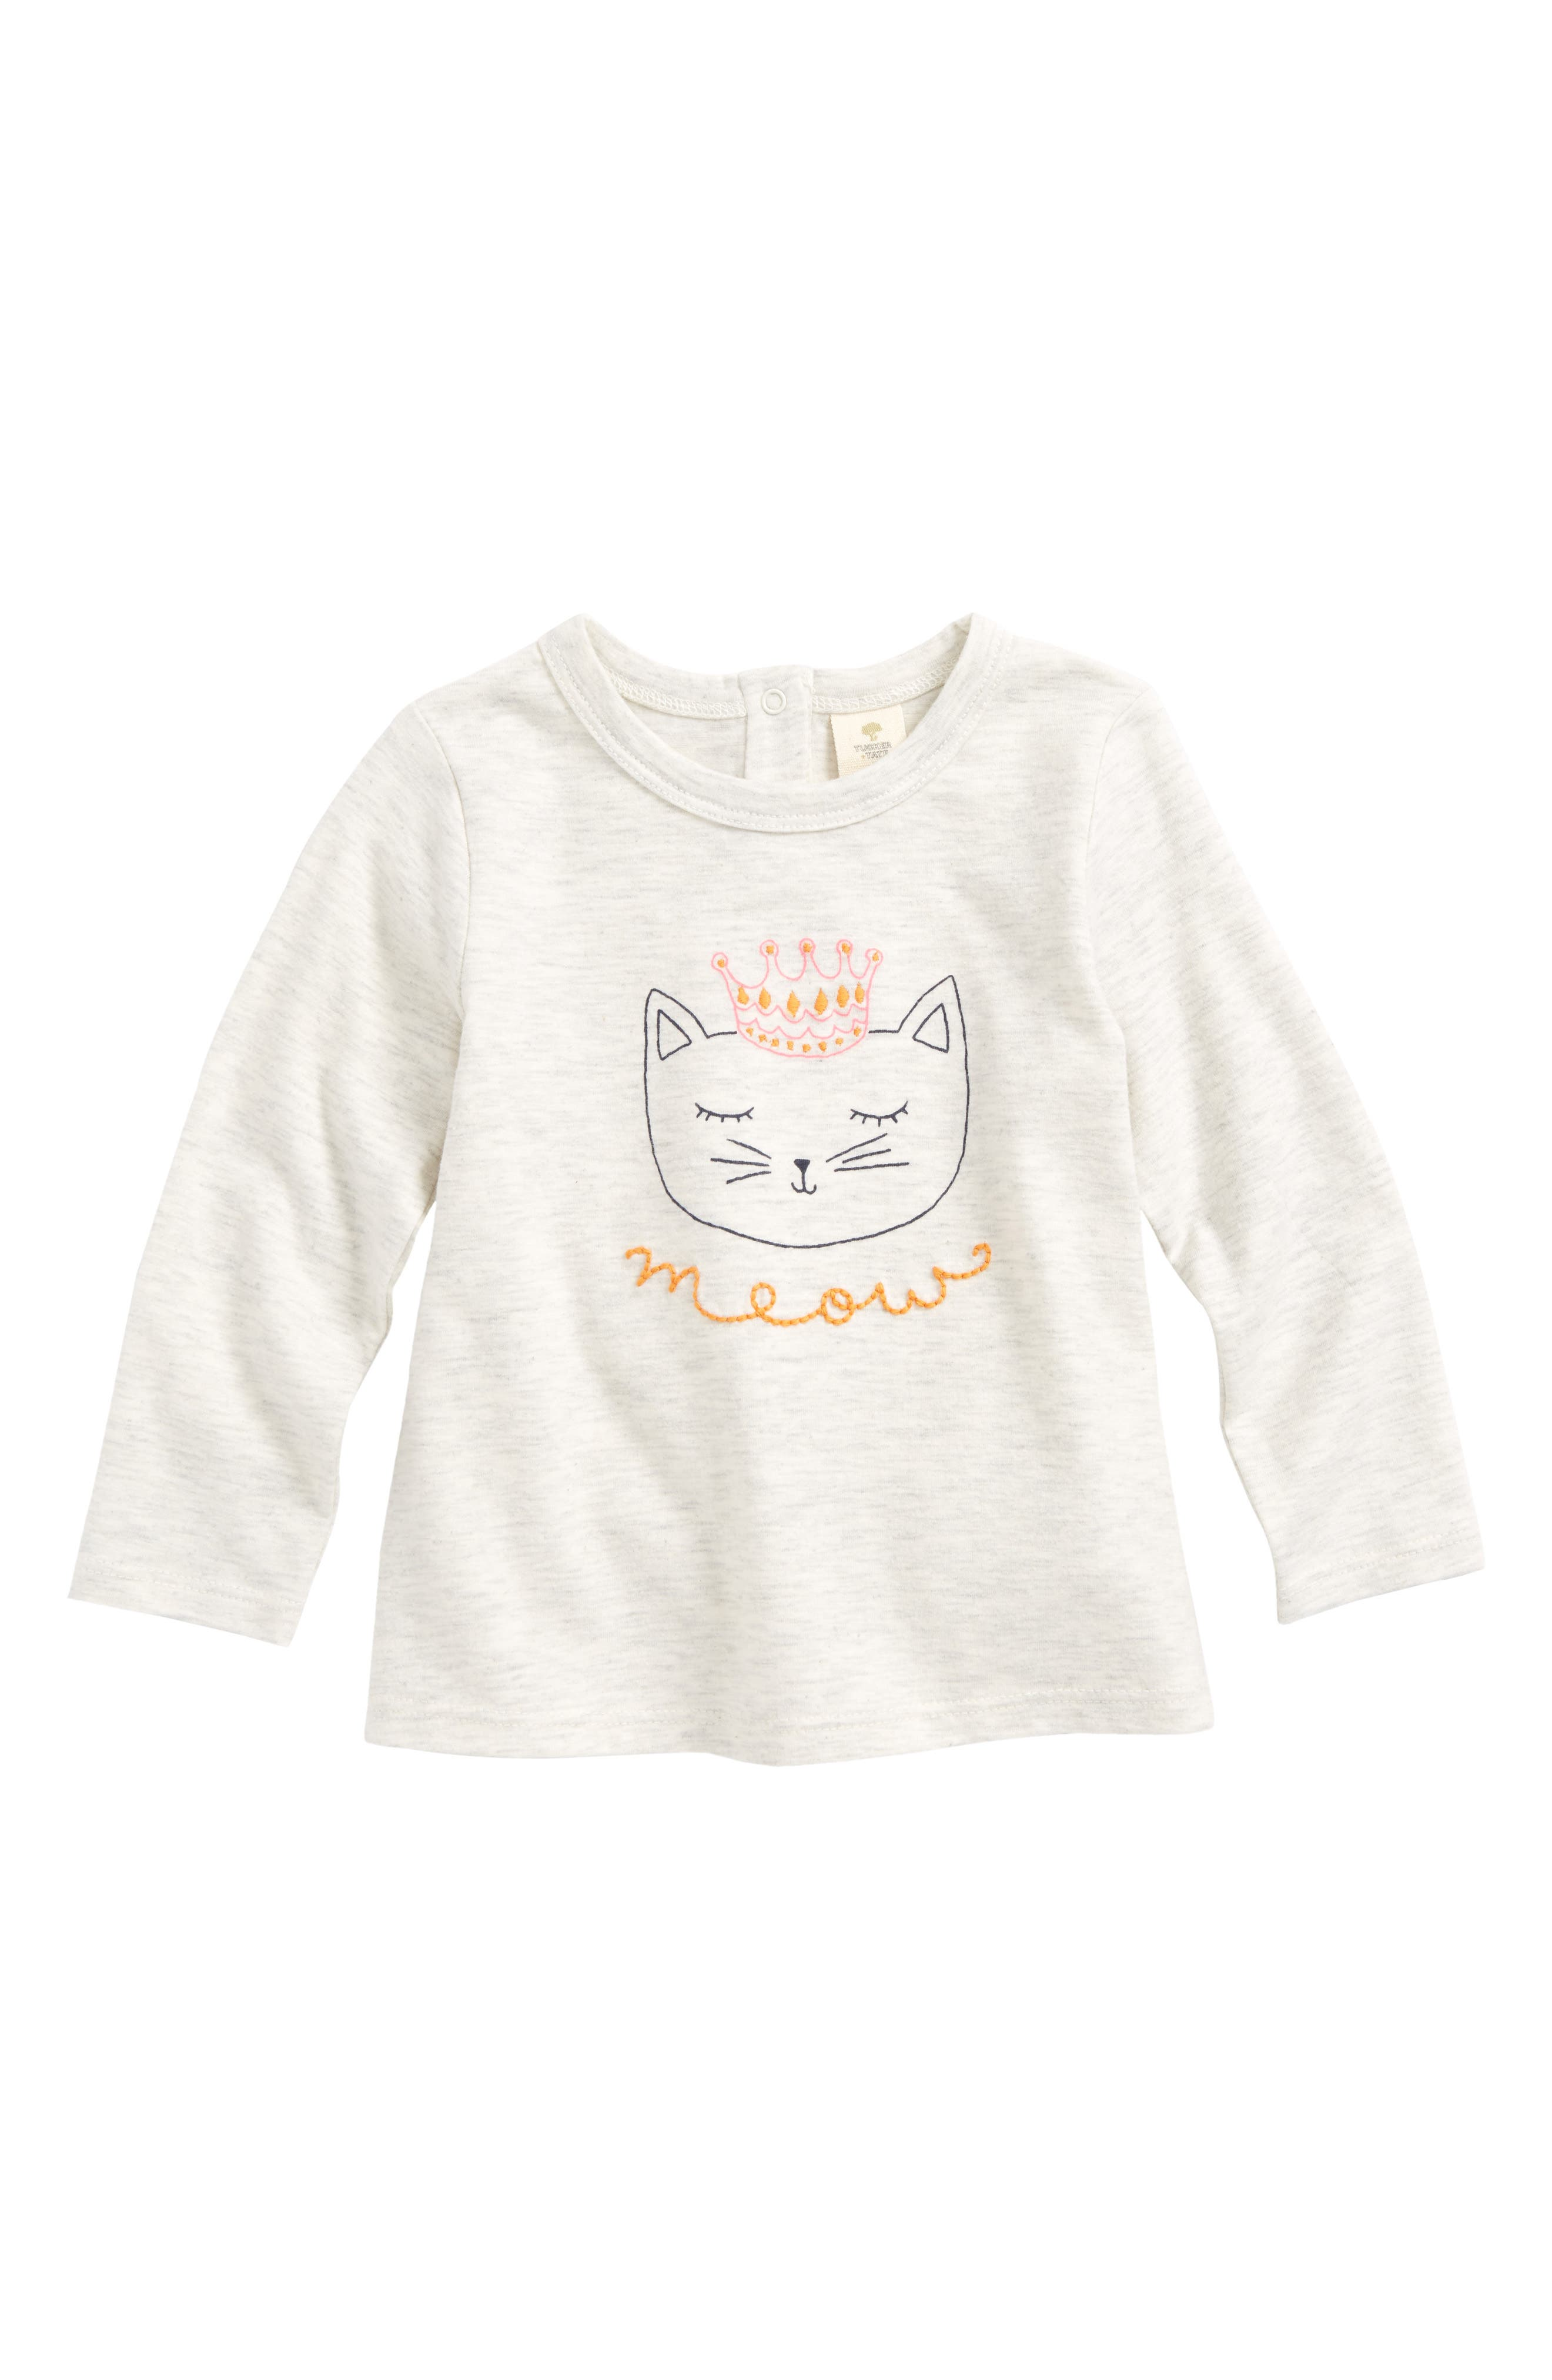 Main Image - Tucker + Tate Embroidered Graphic Tee (Baby Girls)